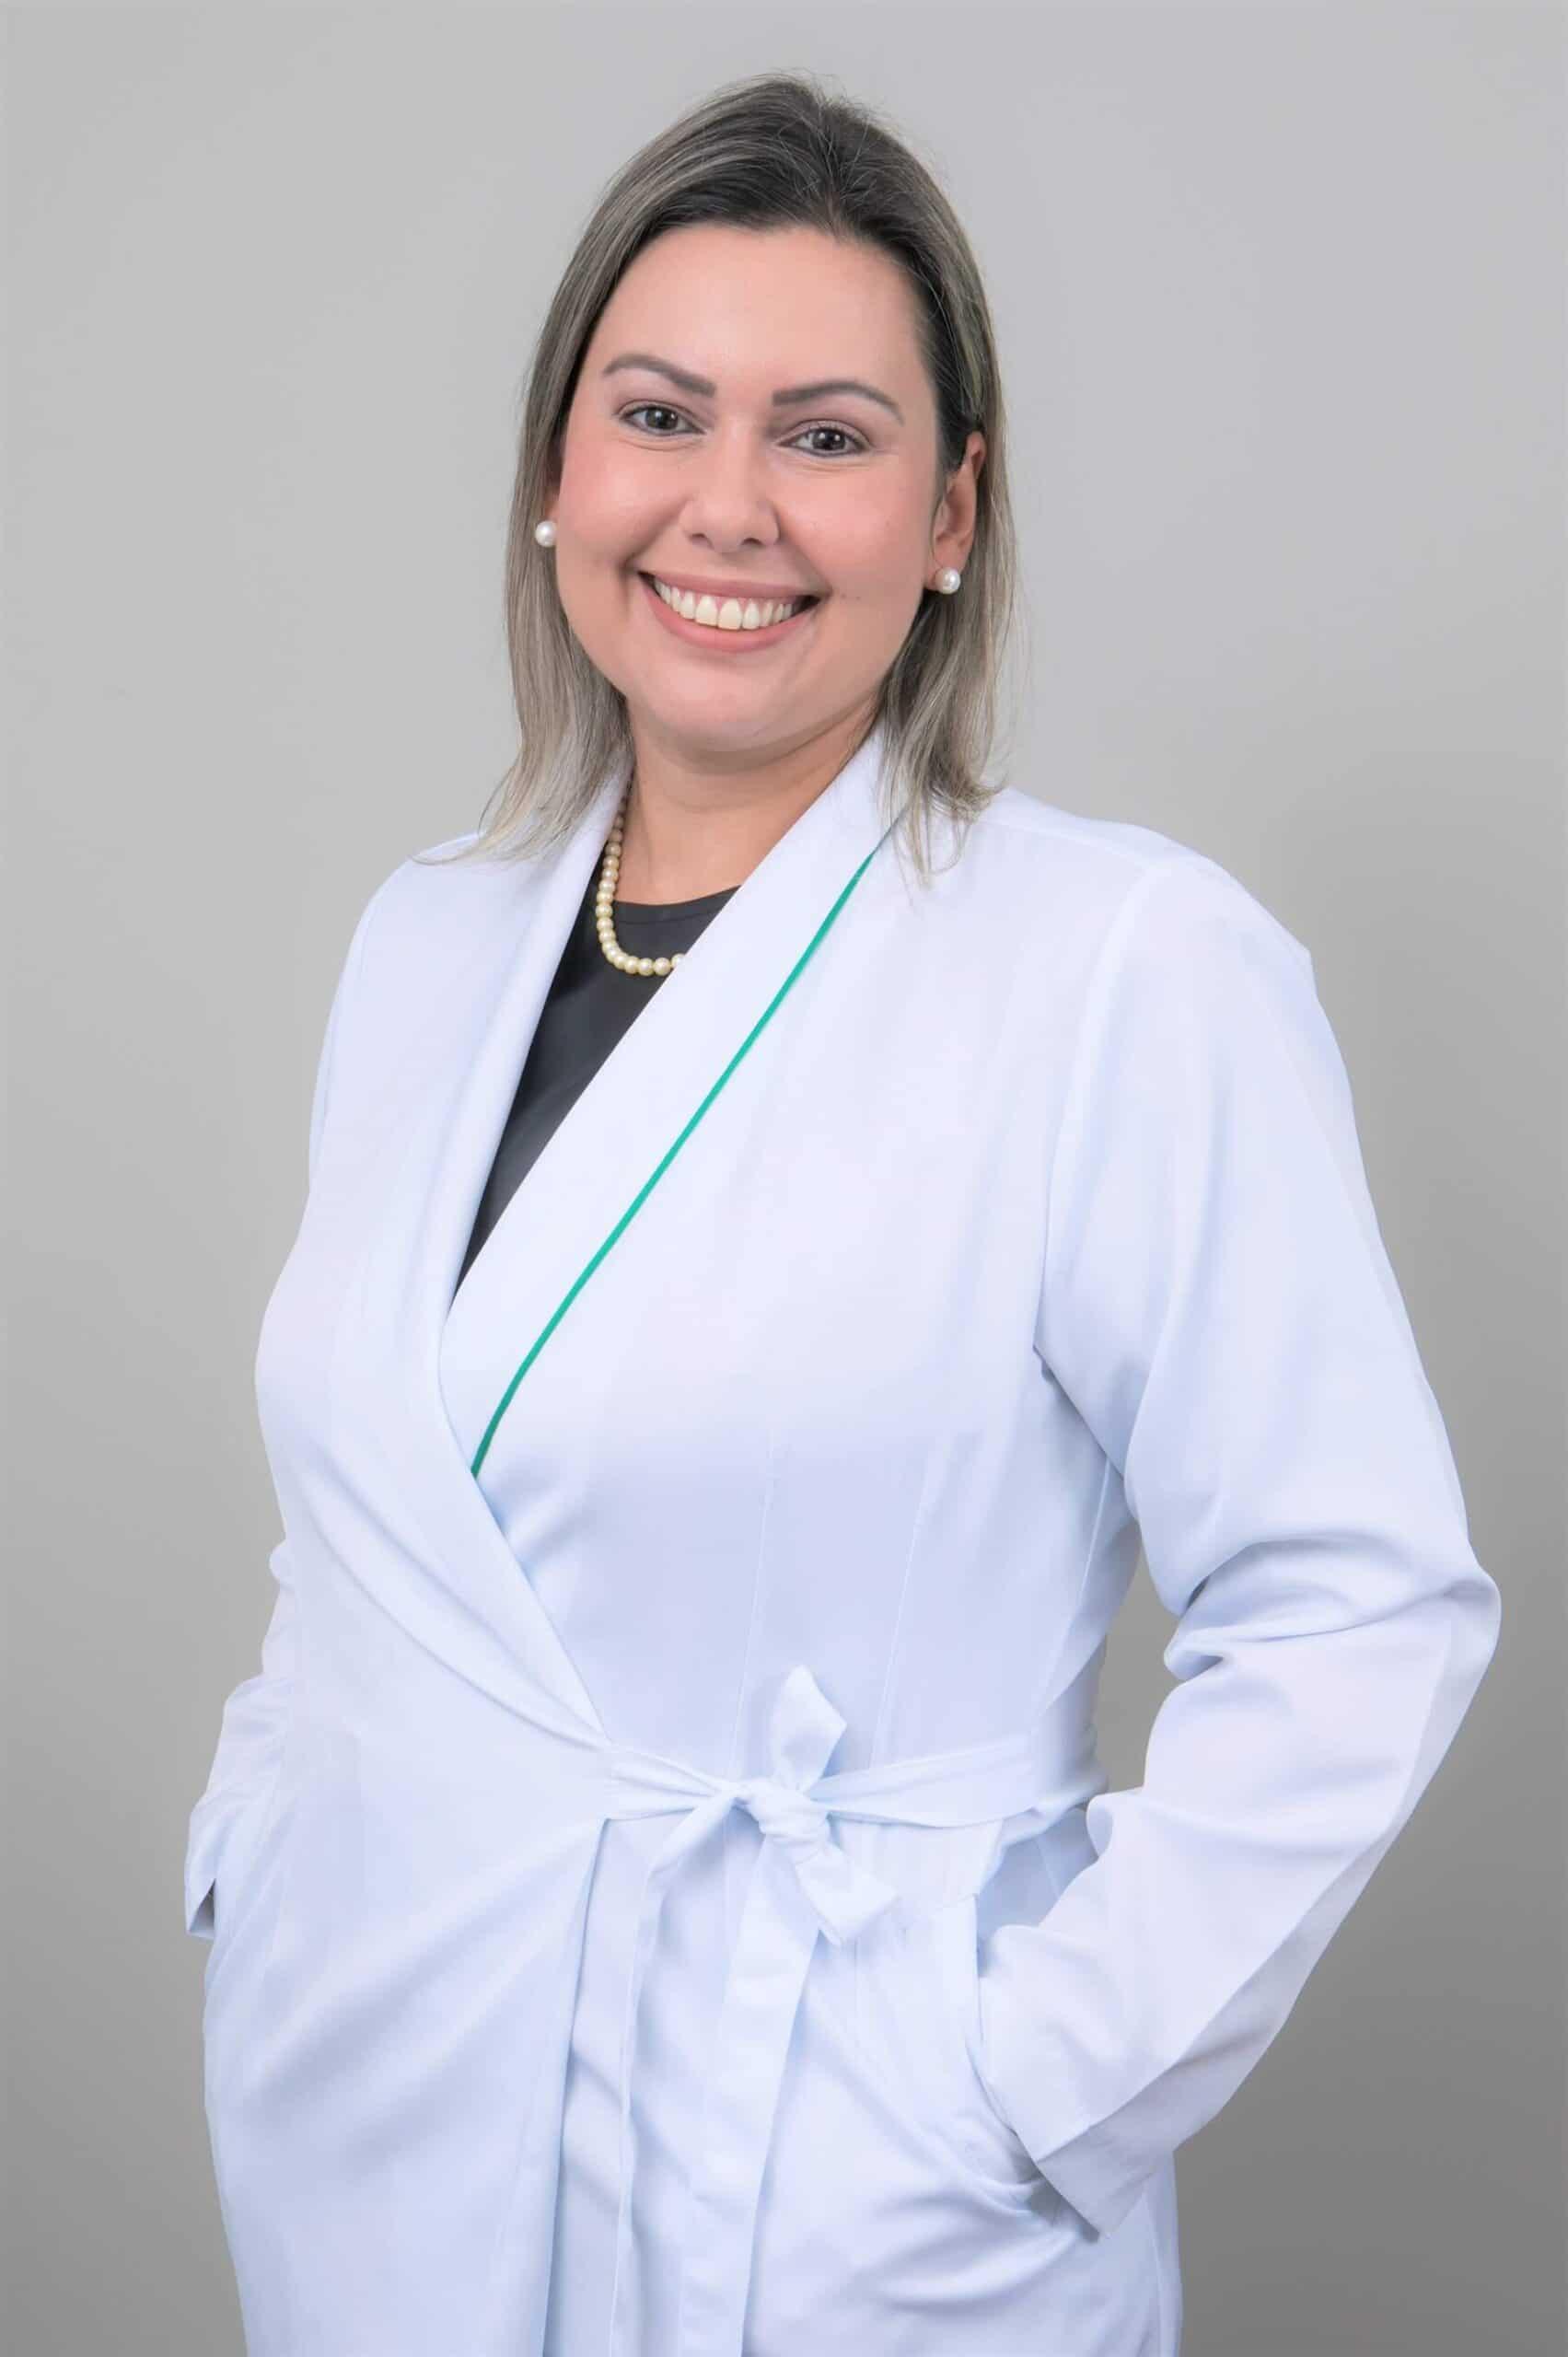 Dra. Roberta Barela Pimentel - Anestesiologista